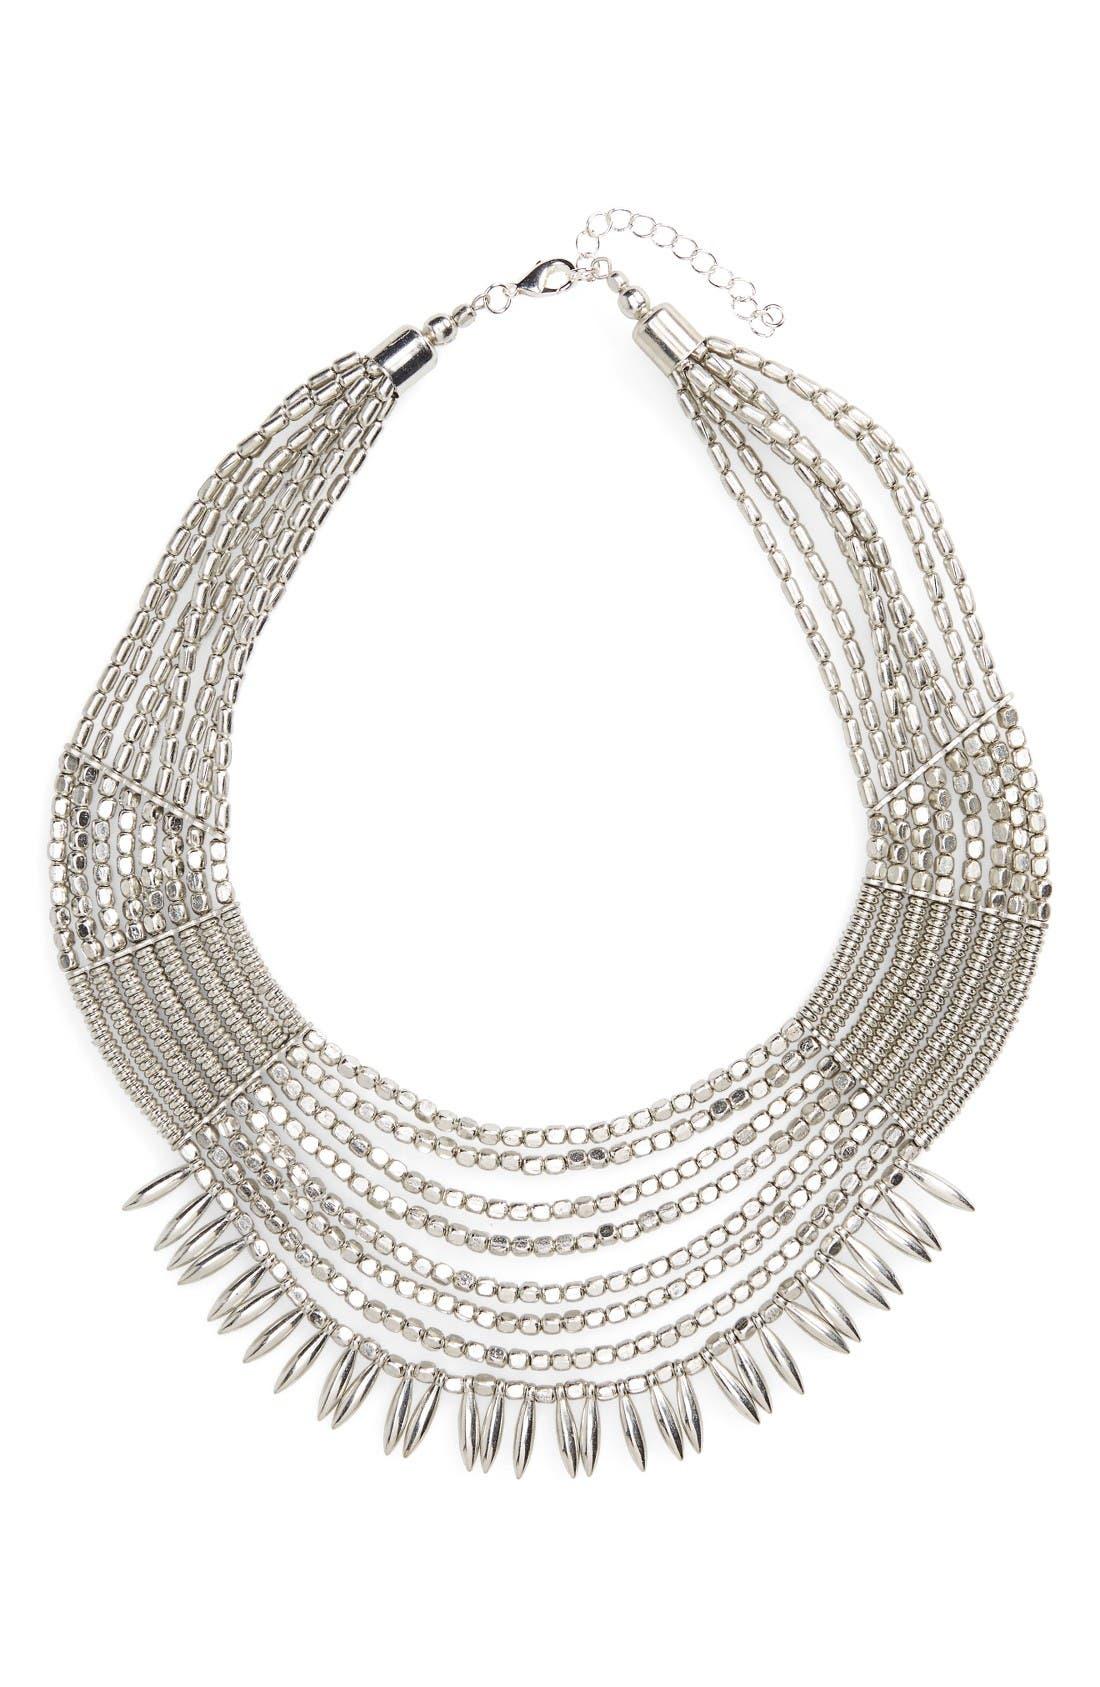 Main Image - Panacea Beaded Collar Statement Necklace